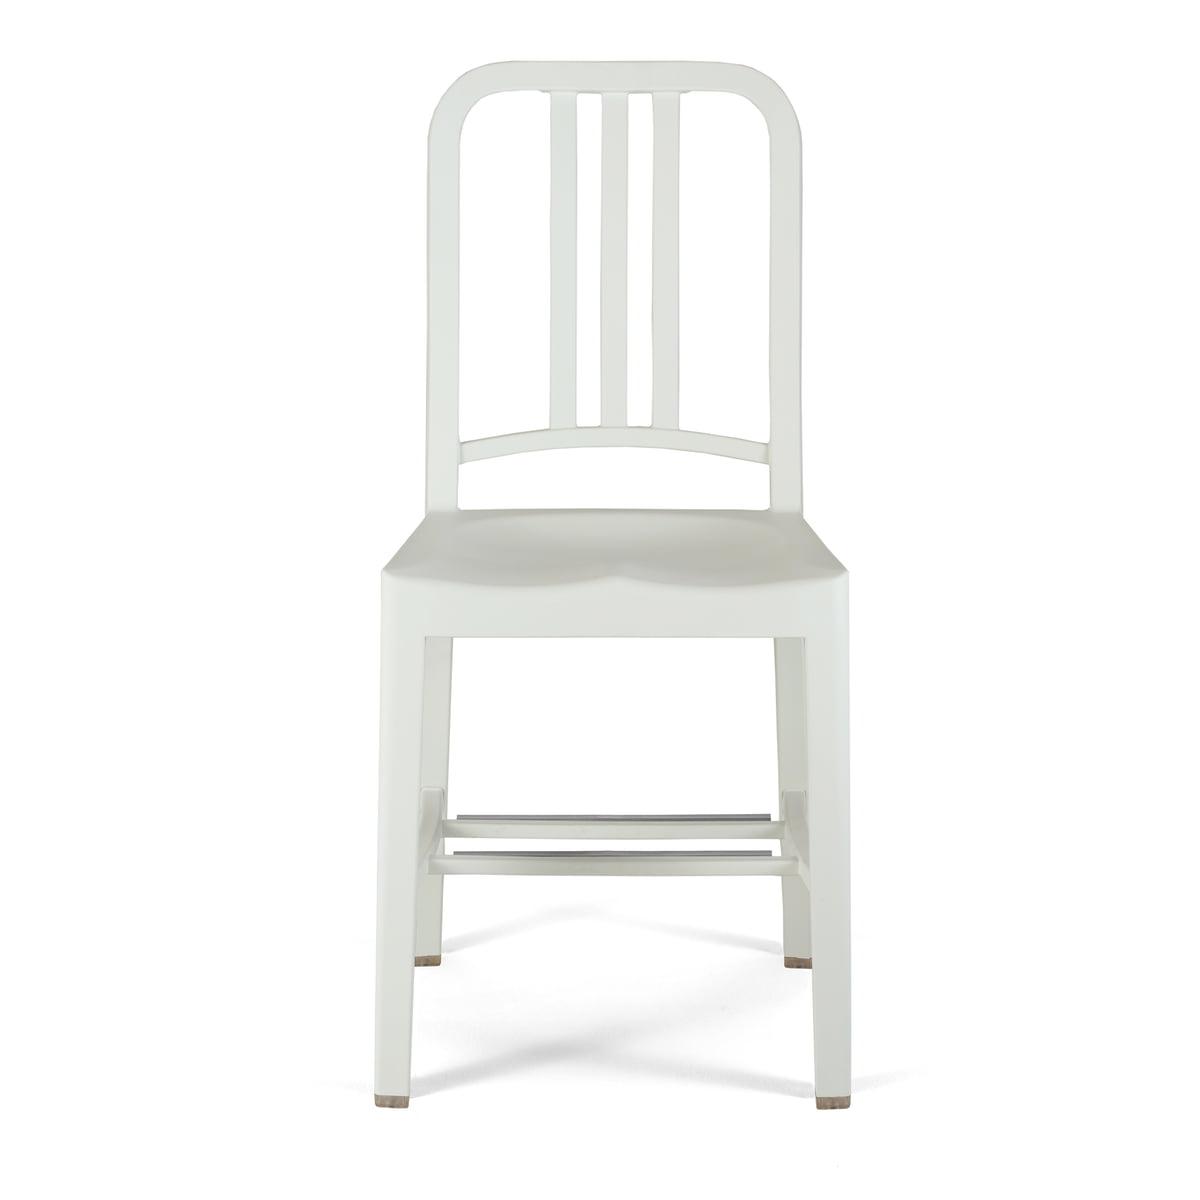 chaise 111 navy coca cola emeco. Black Bedroom Furniture Sets. Home Design Ideas